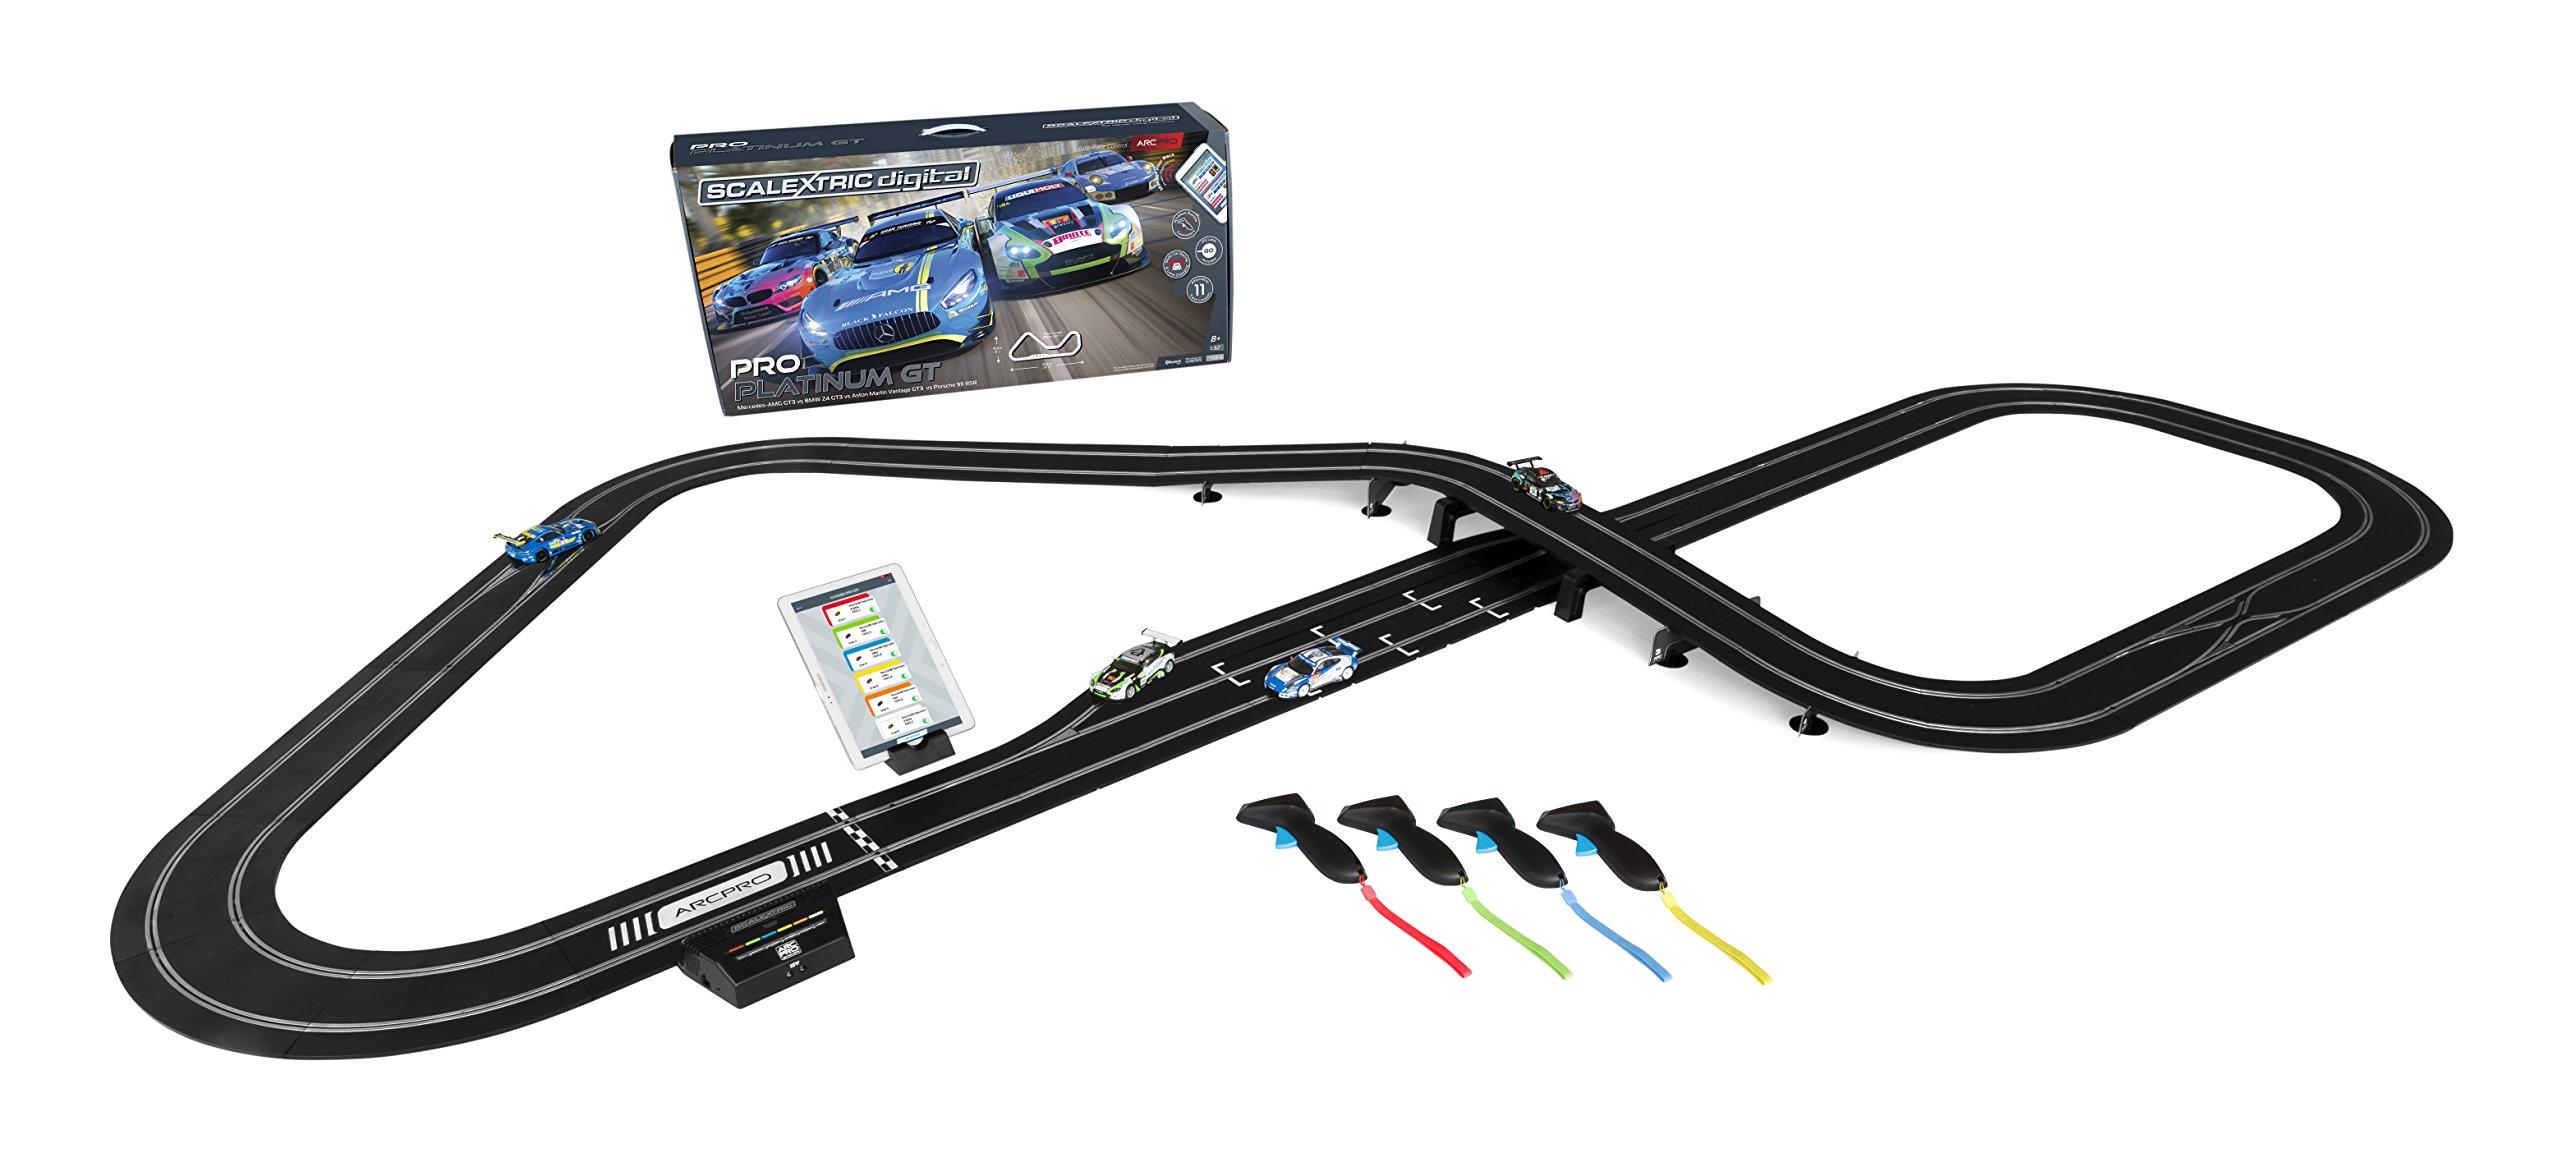 ARC Pro Platinum GT Set Digital Slot Car Race Control System C1374